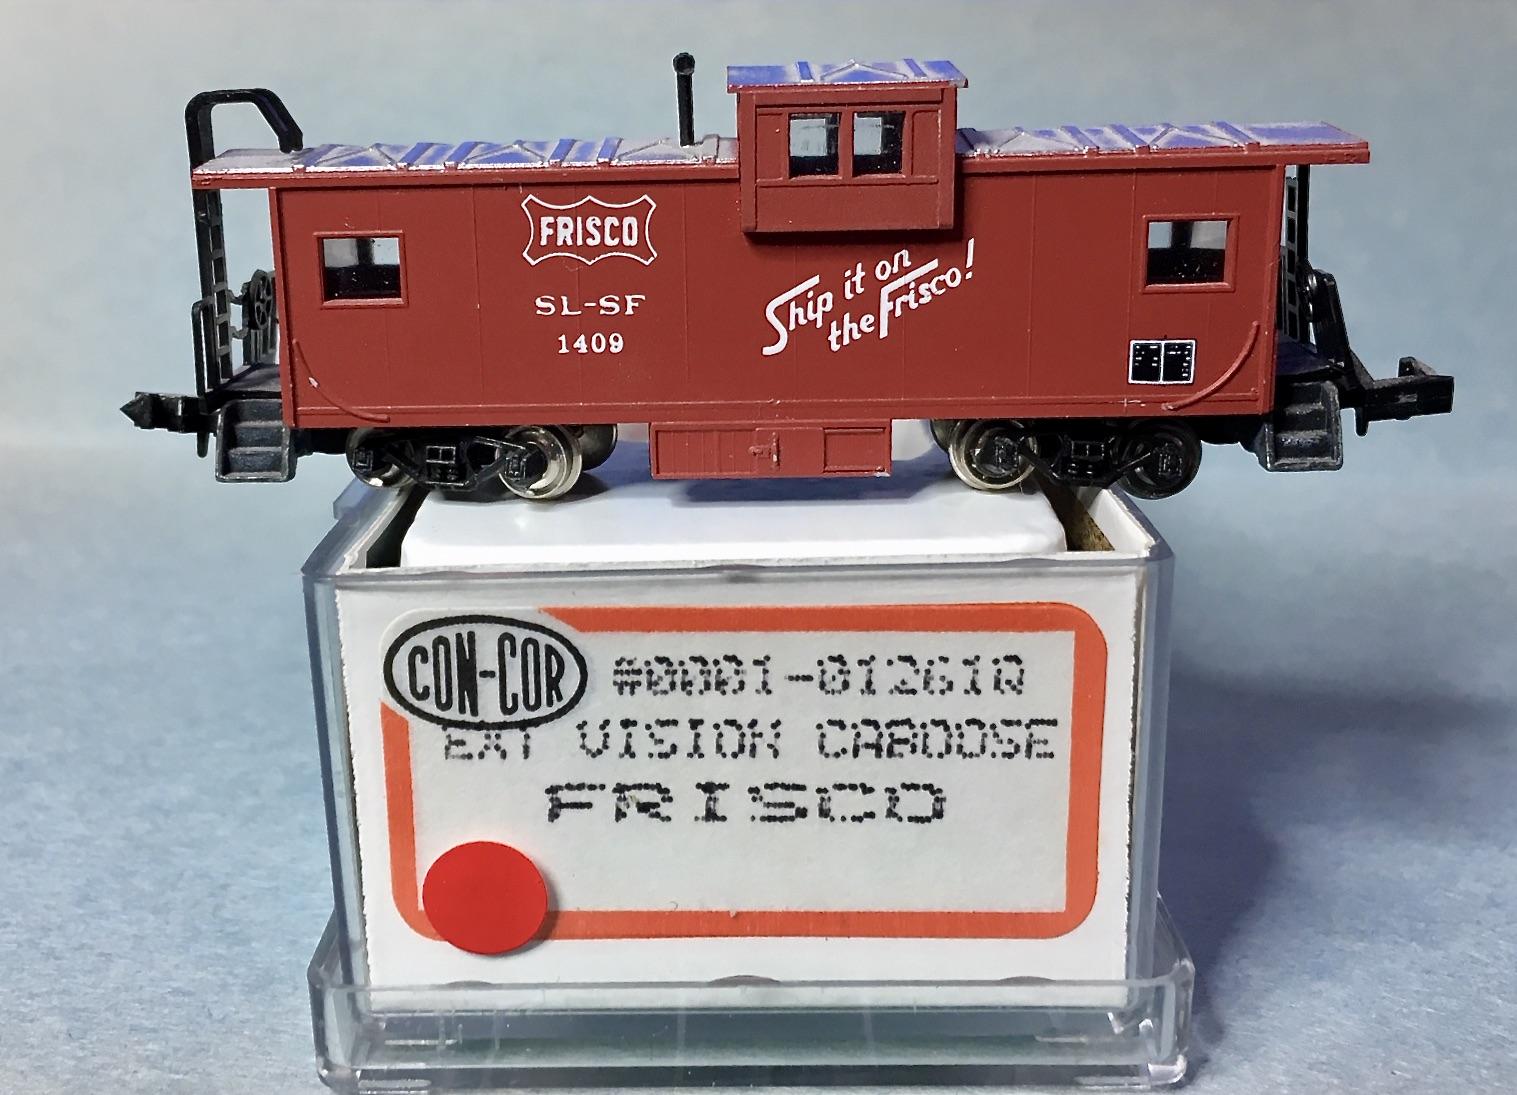 N Scale - Con-Cor - 0001-01261Q - Caboose, Cupola, MI - Frisco - 1409